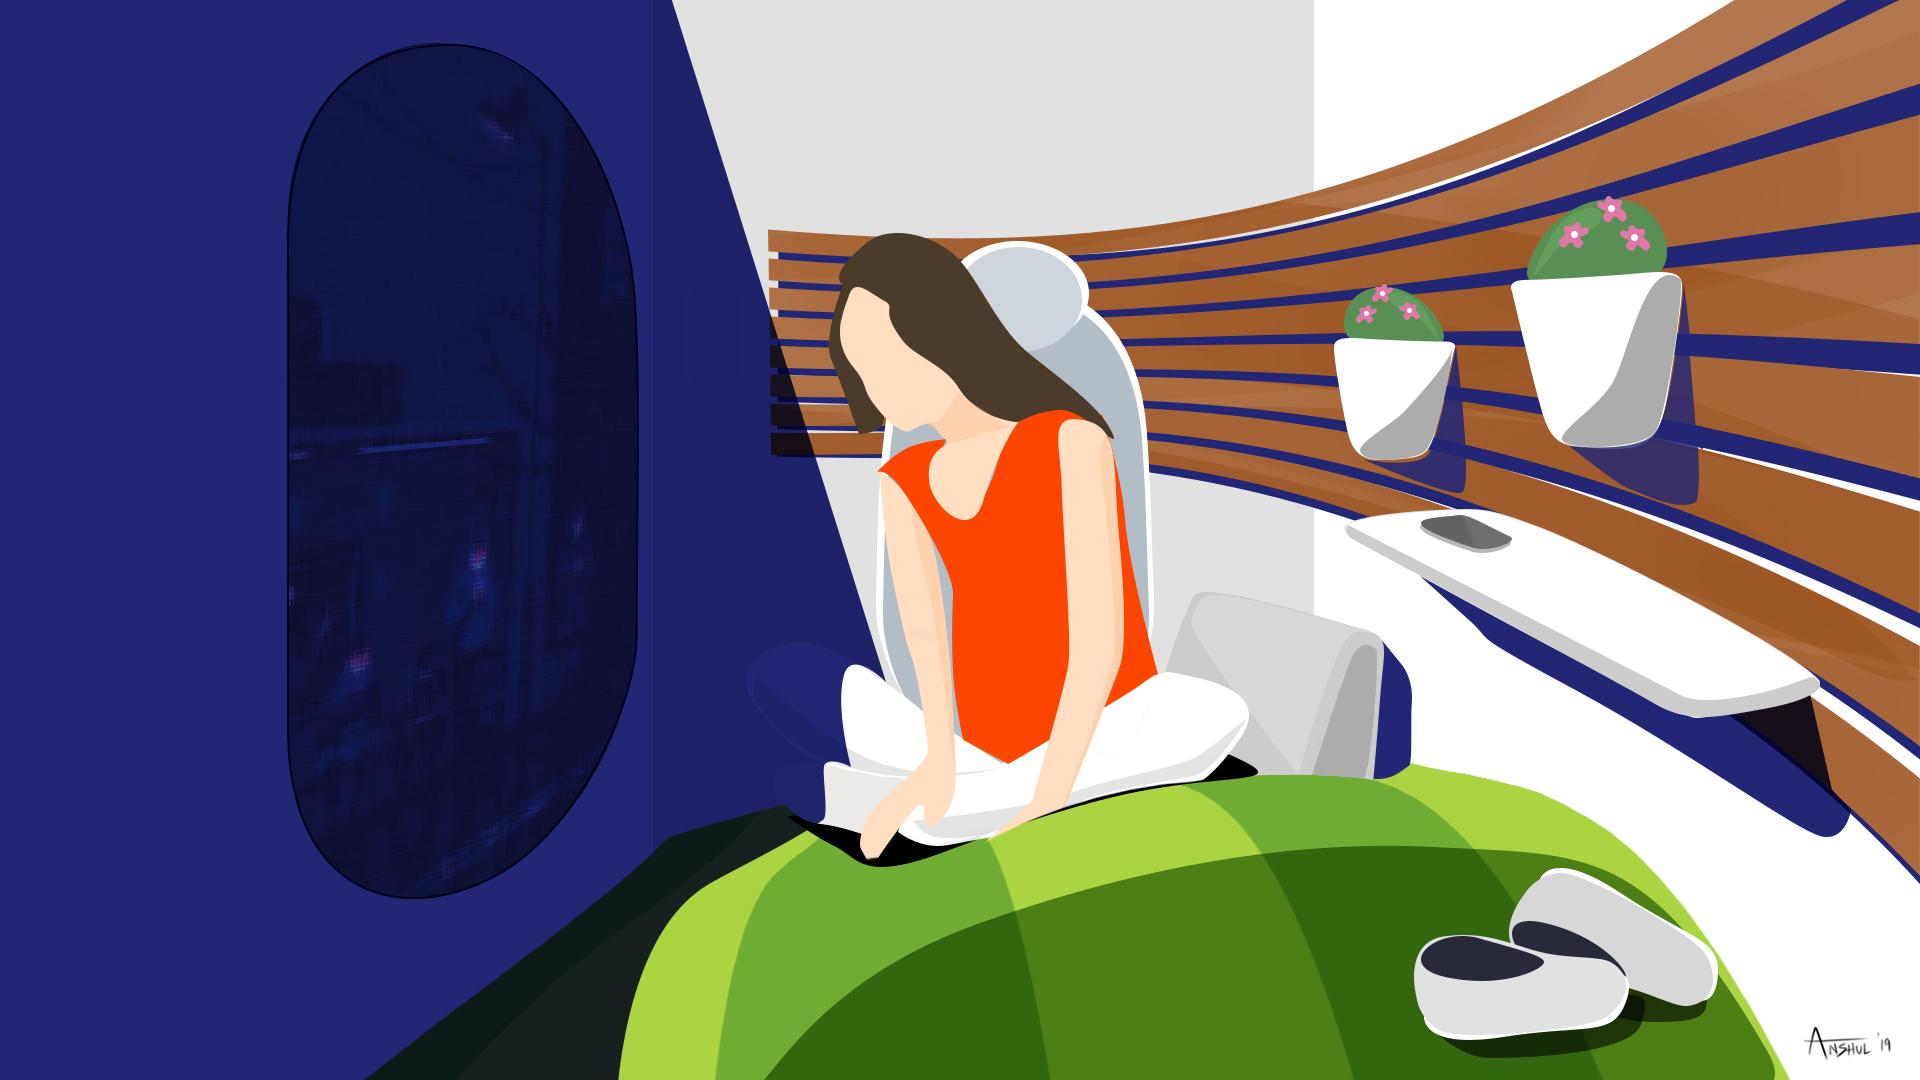 illustration_week8-2.jpg